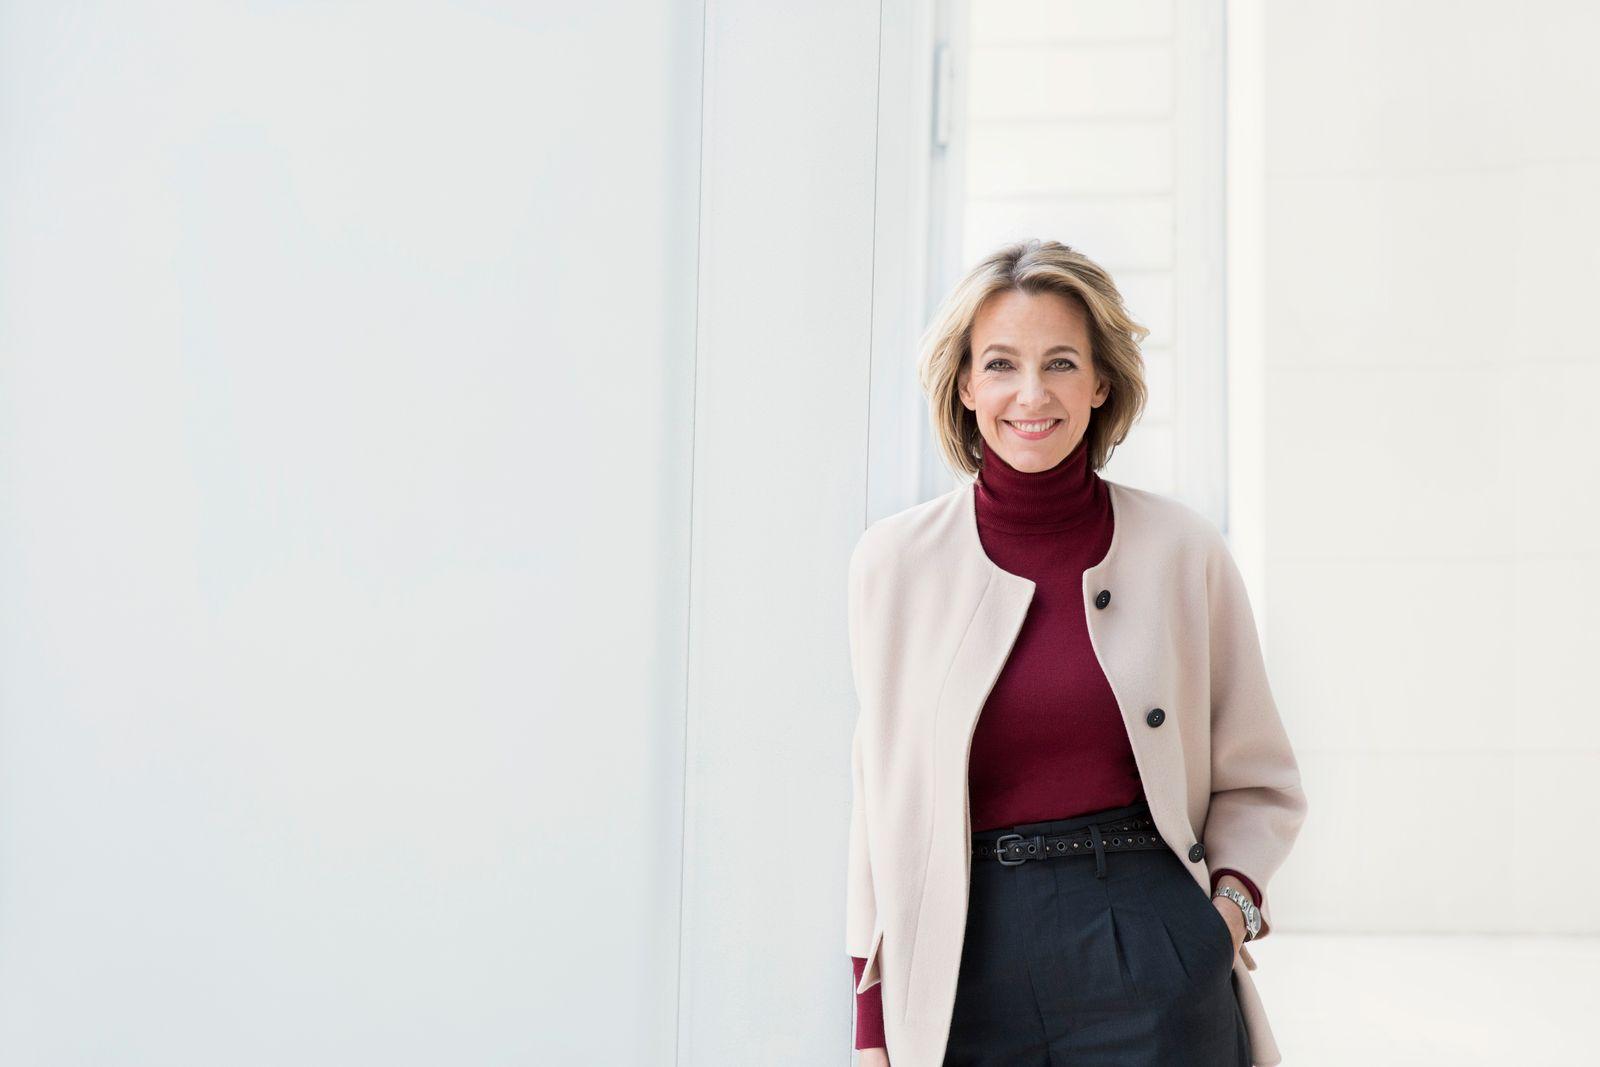 julia-jaekel-bertelsmann2017